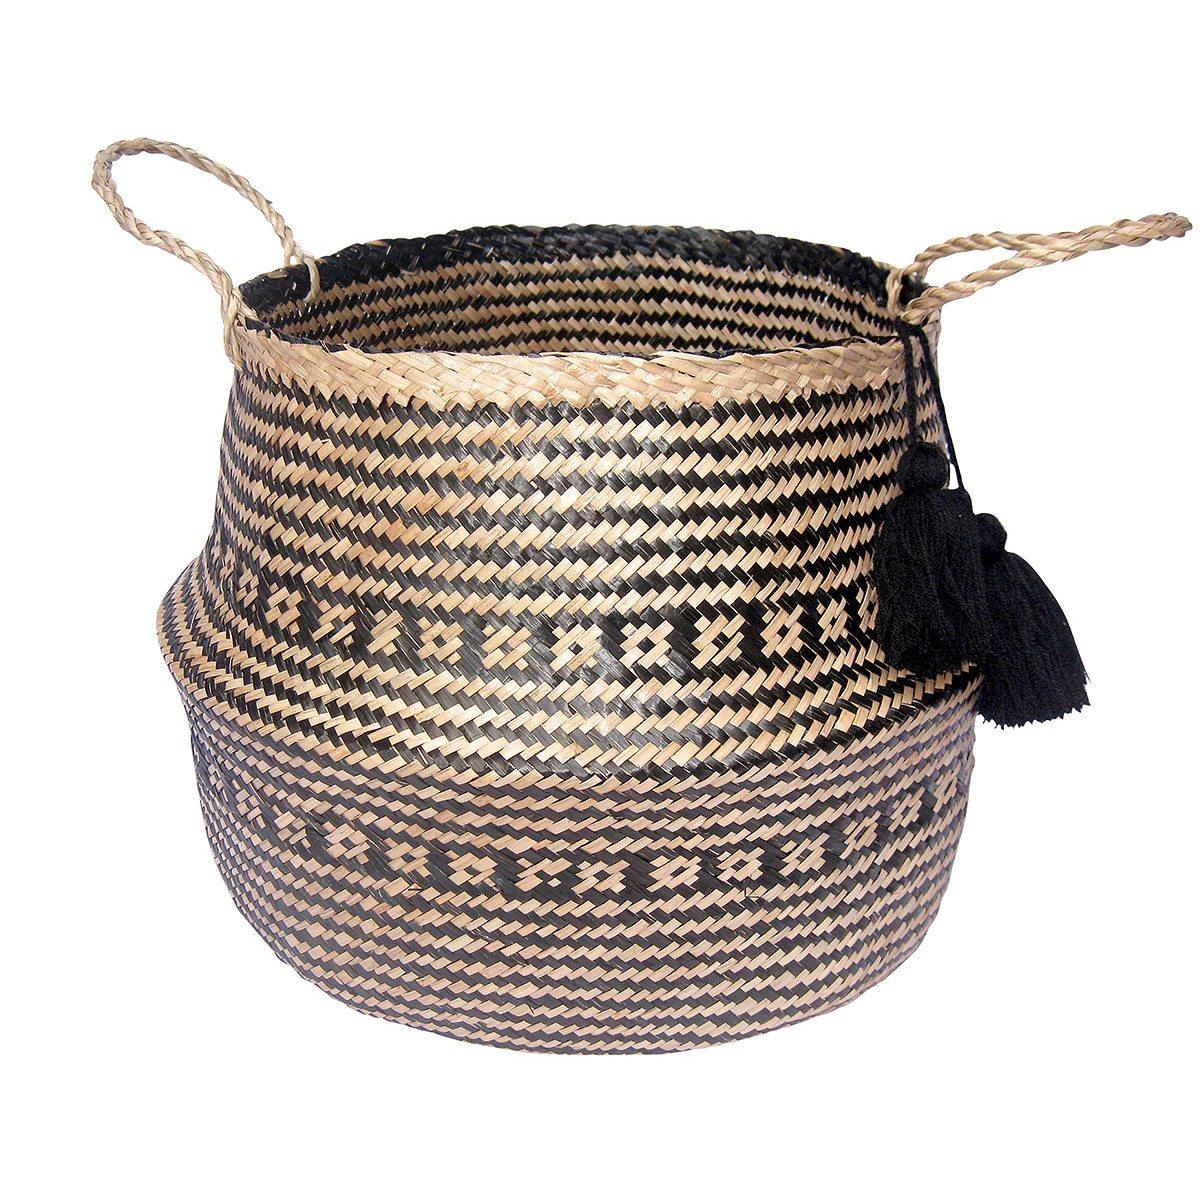 black-and-woven-basket-shopceladon